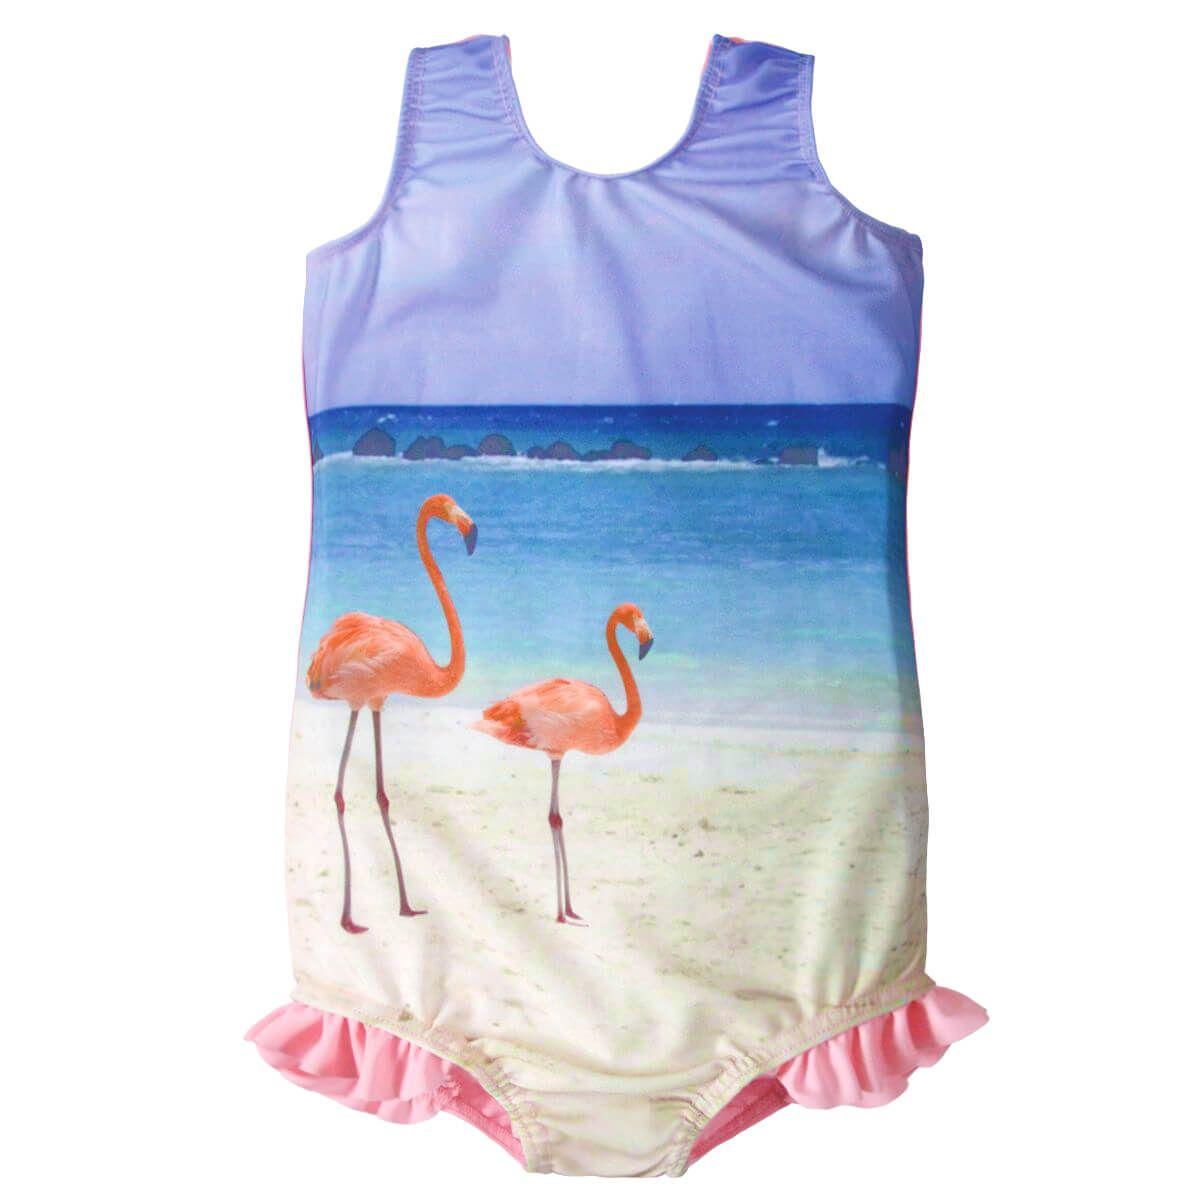 Swimming Costume Pink Funky Flamingo Girls Swimsuit